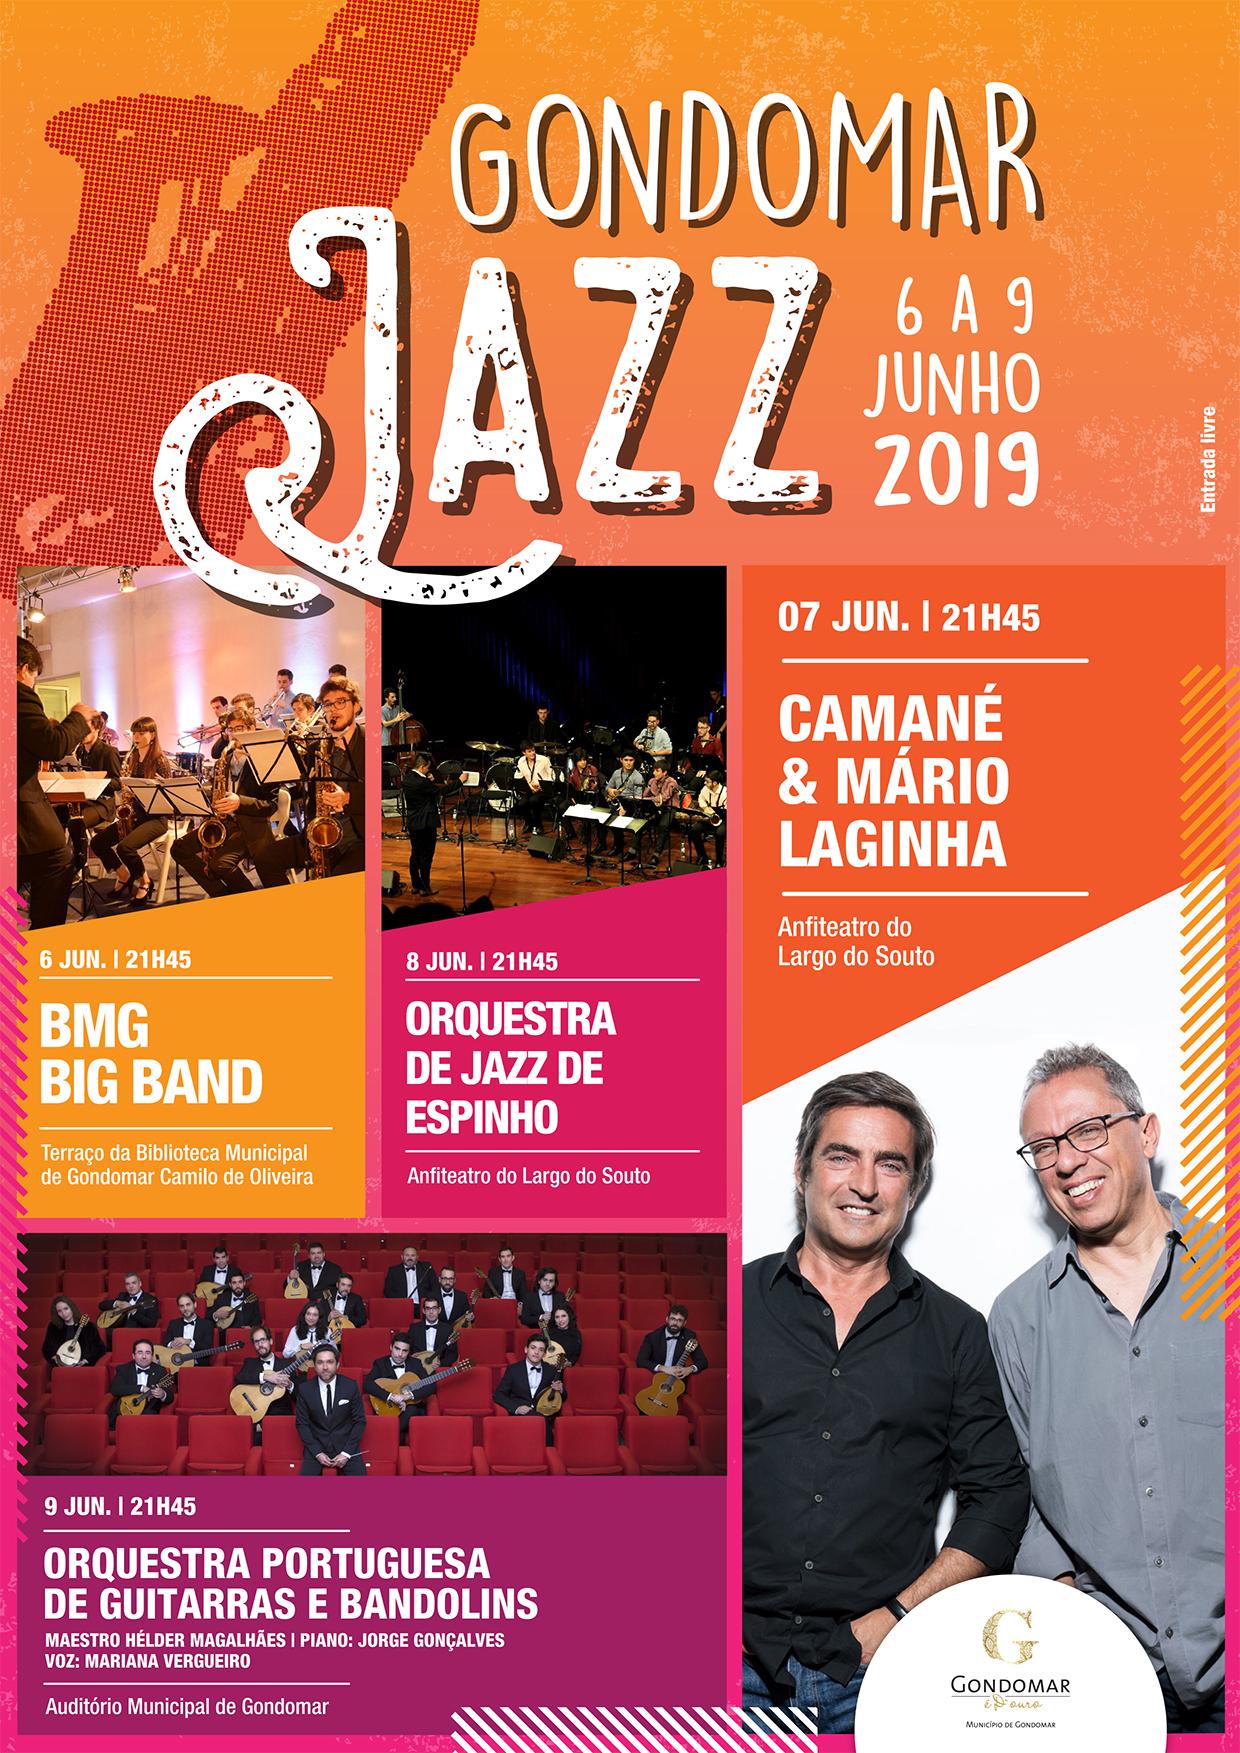 Cartaz Gondomar Jazz 2019 (1).jpg